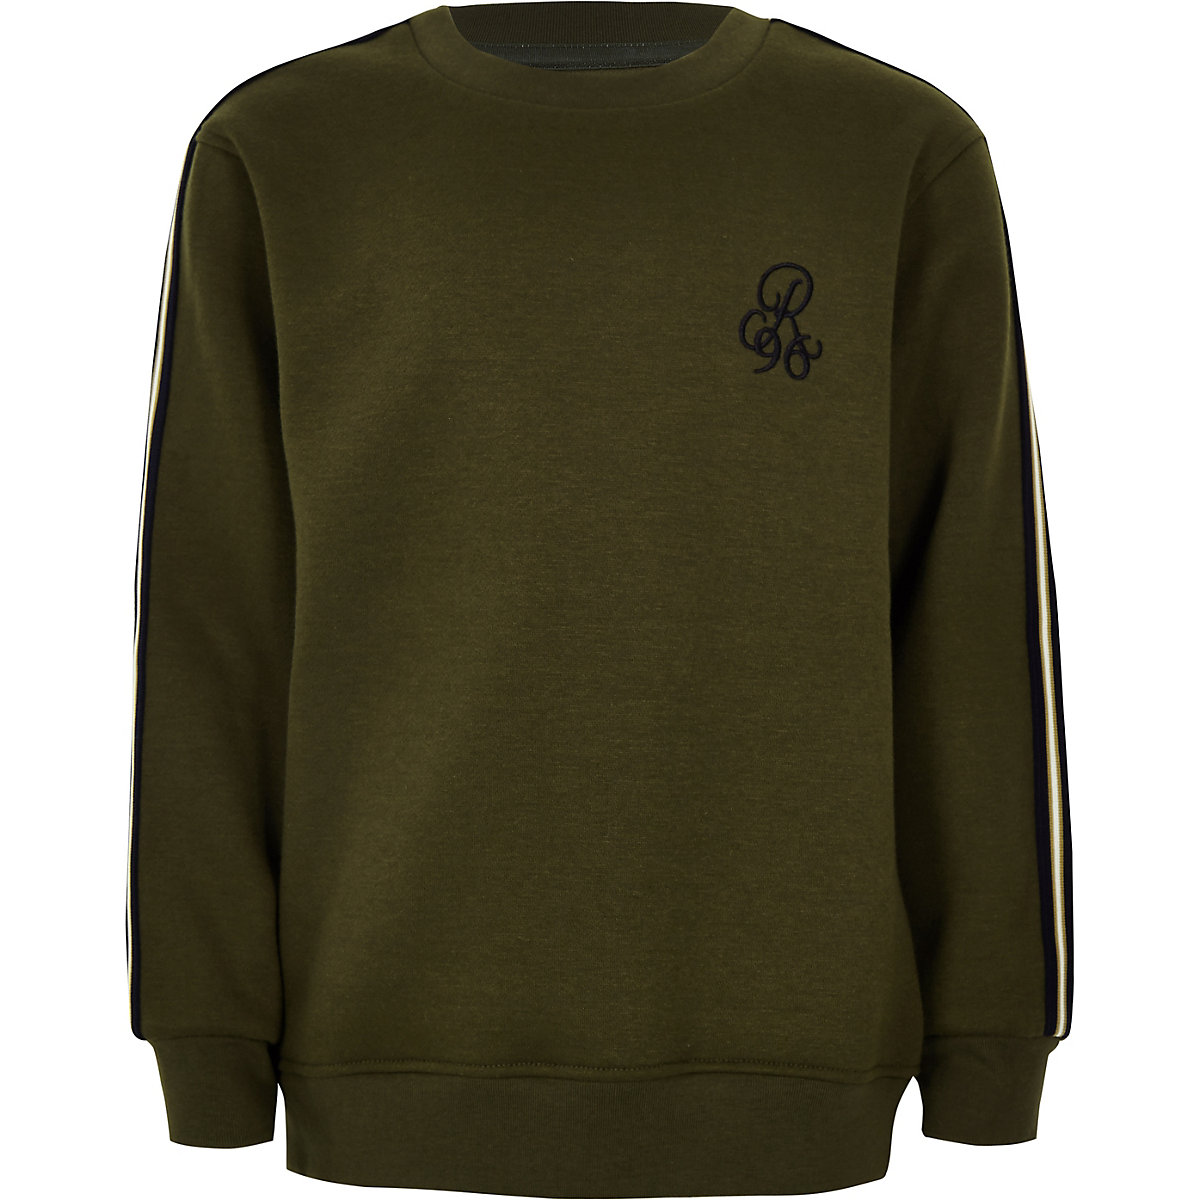 Boys khaki green 'R96' tape side sweater